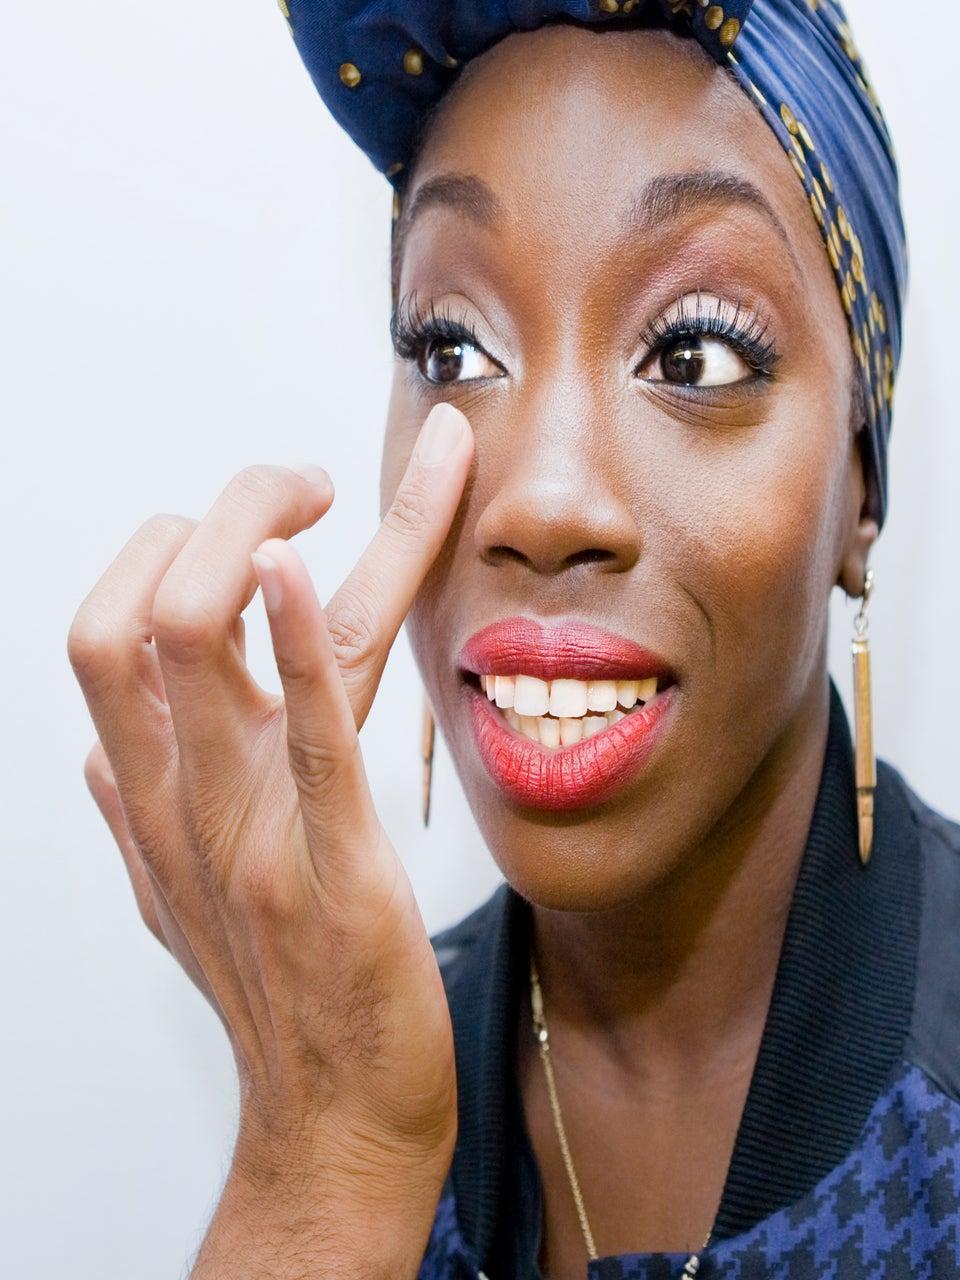 Must-See: Estelle Reveals Her Secret Beauty Must-Haves